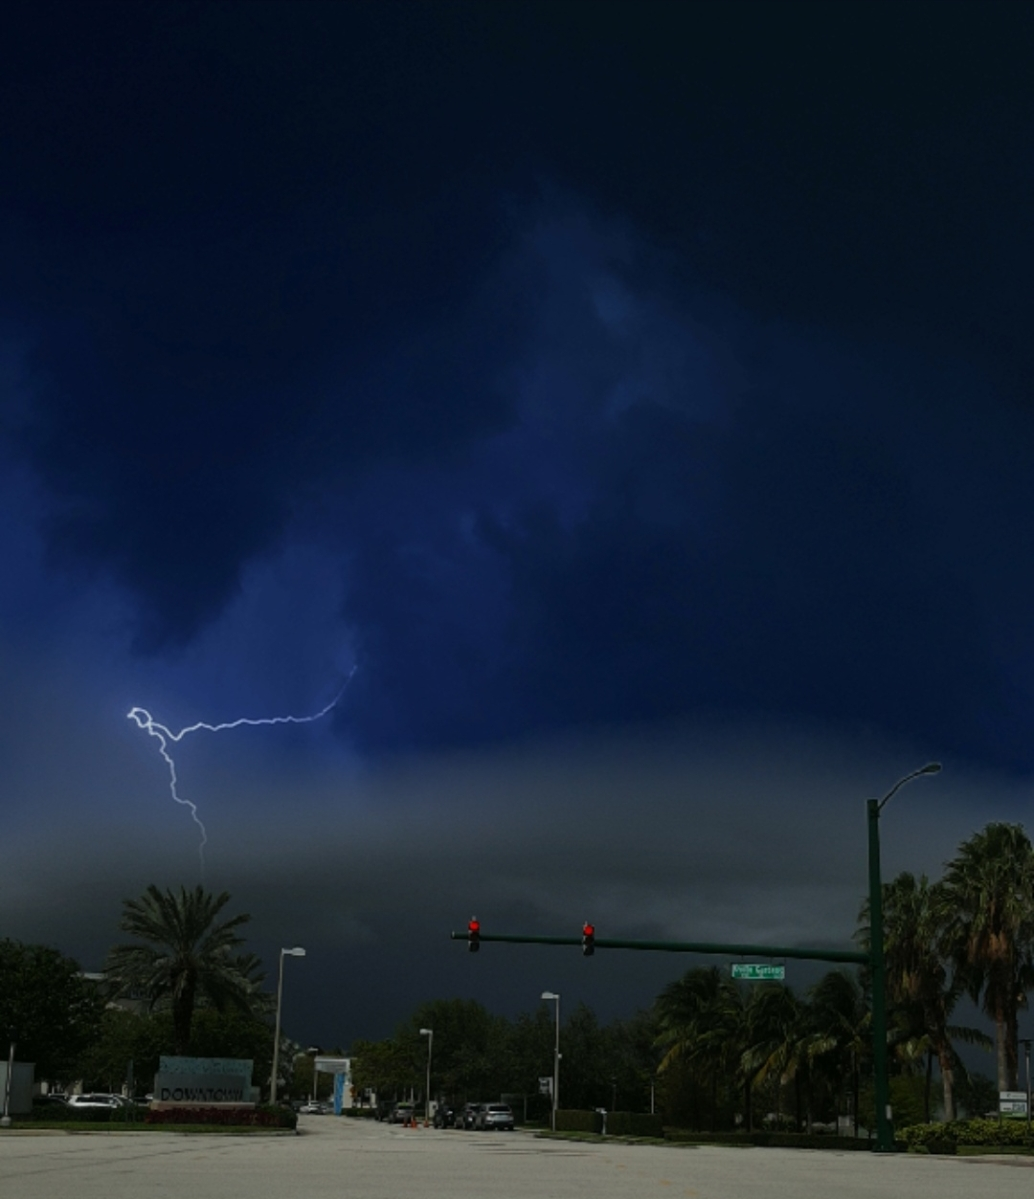 Lightning in palm beach gardens fl weather picture of - Weather palm beach gardens florida ...